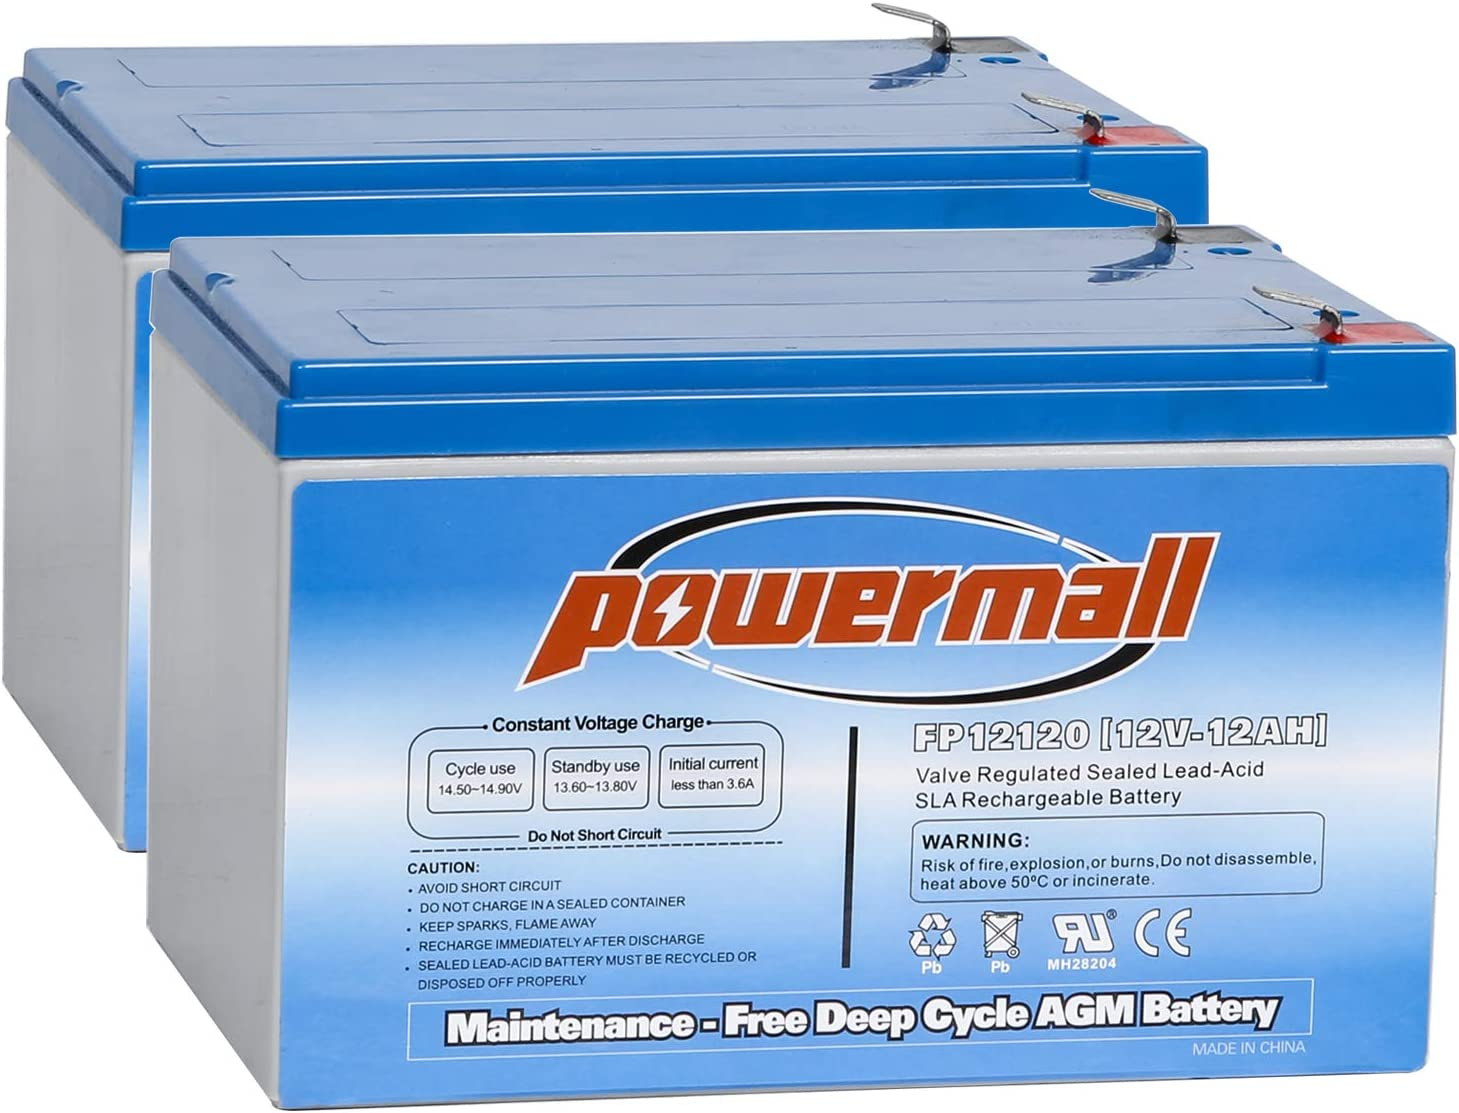 Weize 12 Volt 12AH SLA Rechargeable Battery Replace UB12120, EXP1212, 6FM12, LHR12-12, GPS12-12, F2, 2 Pack